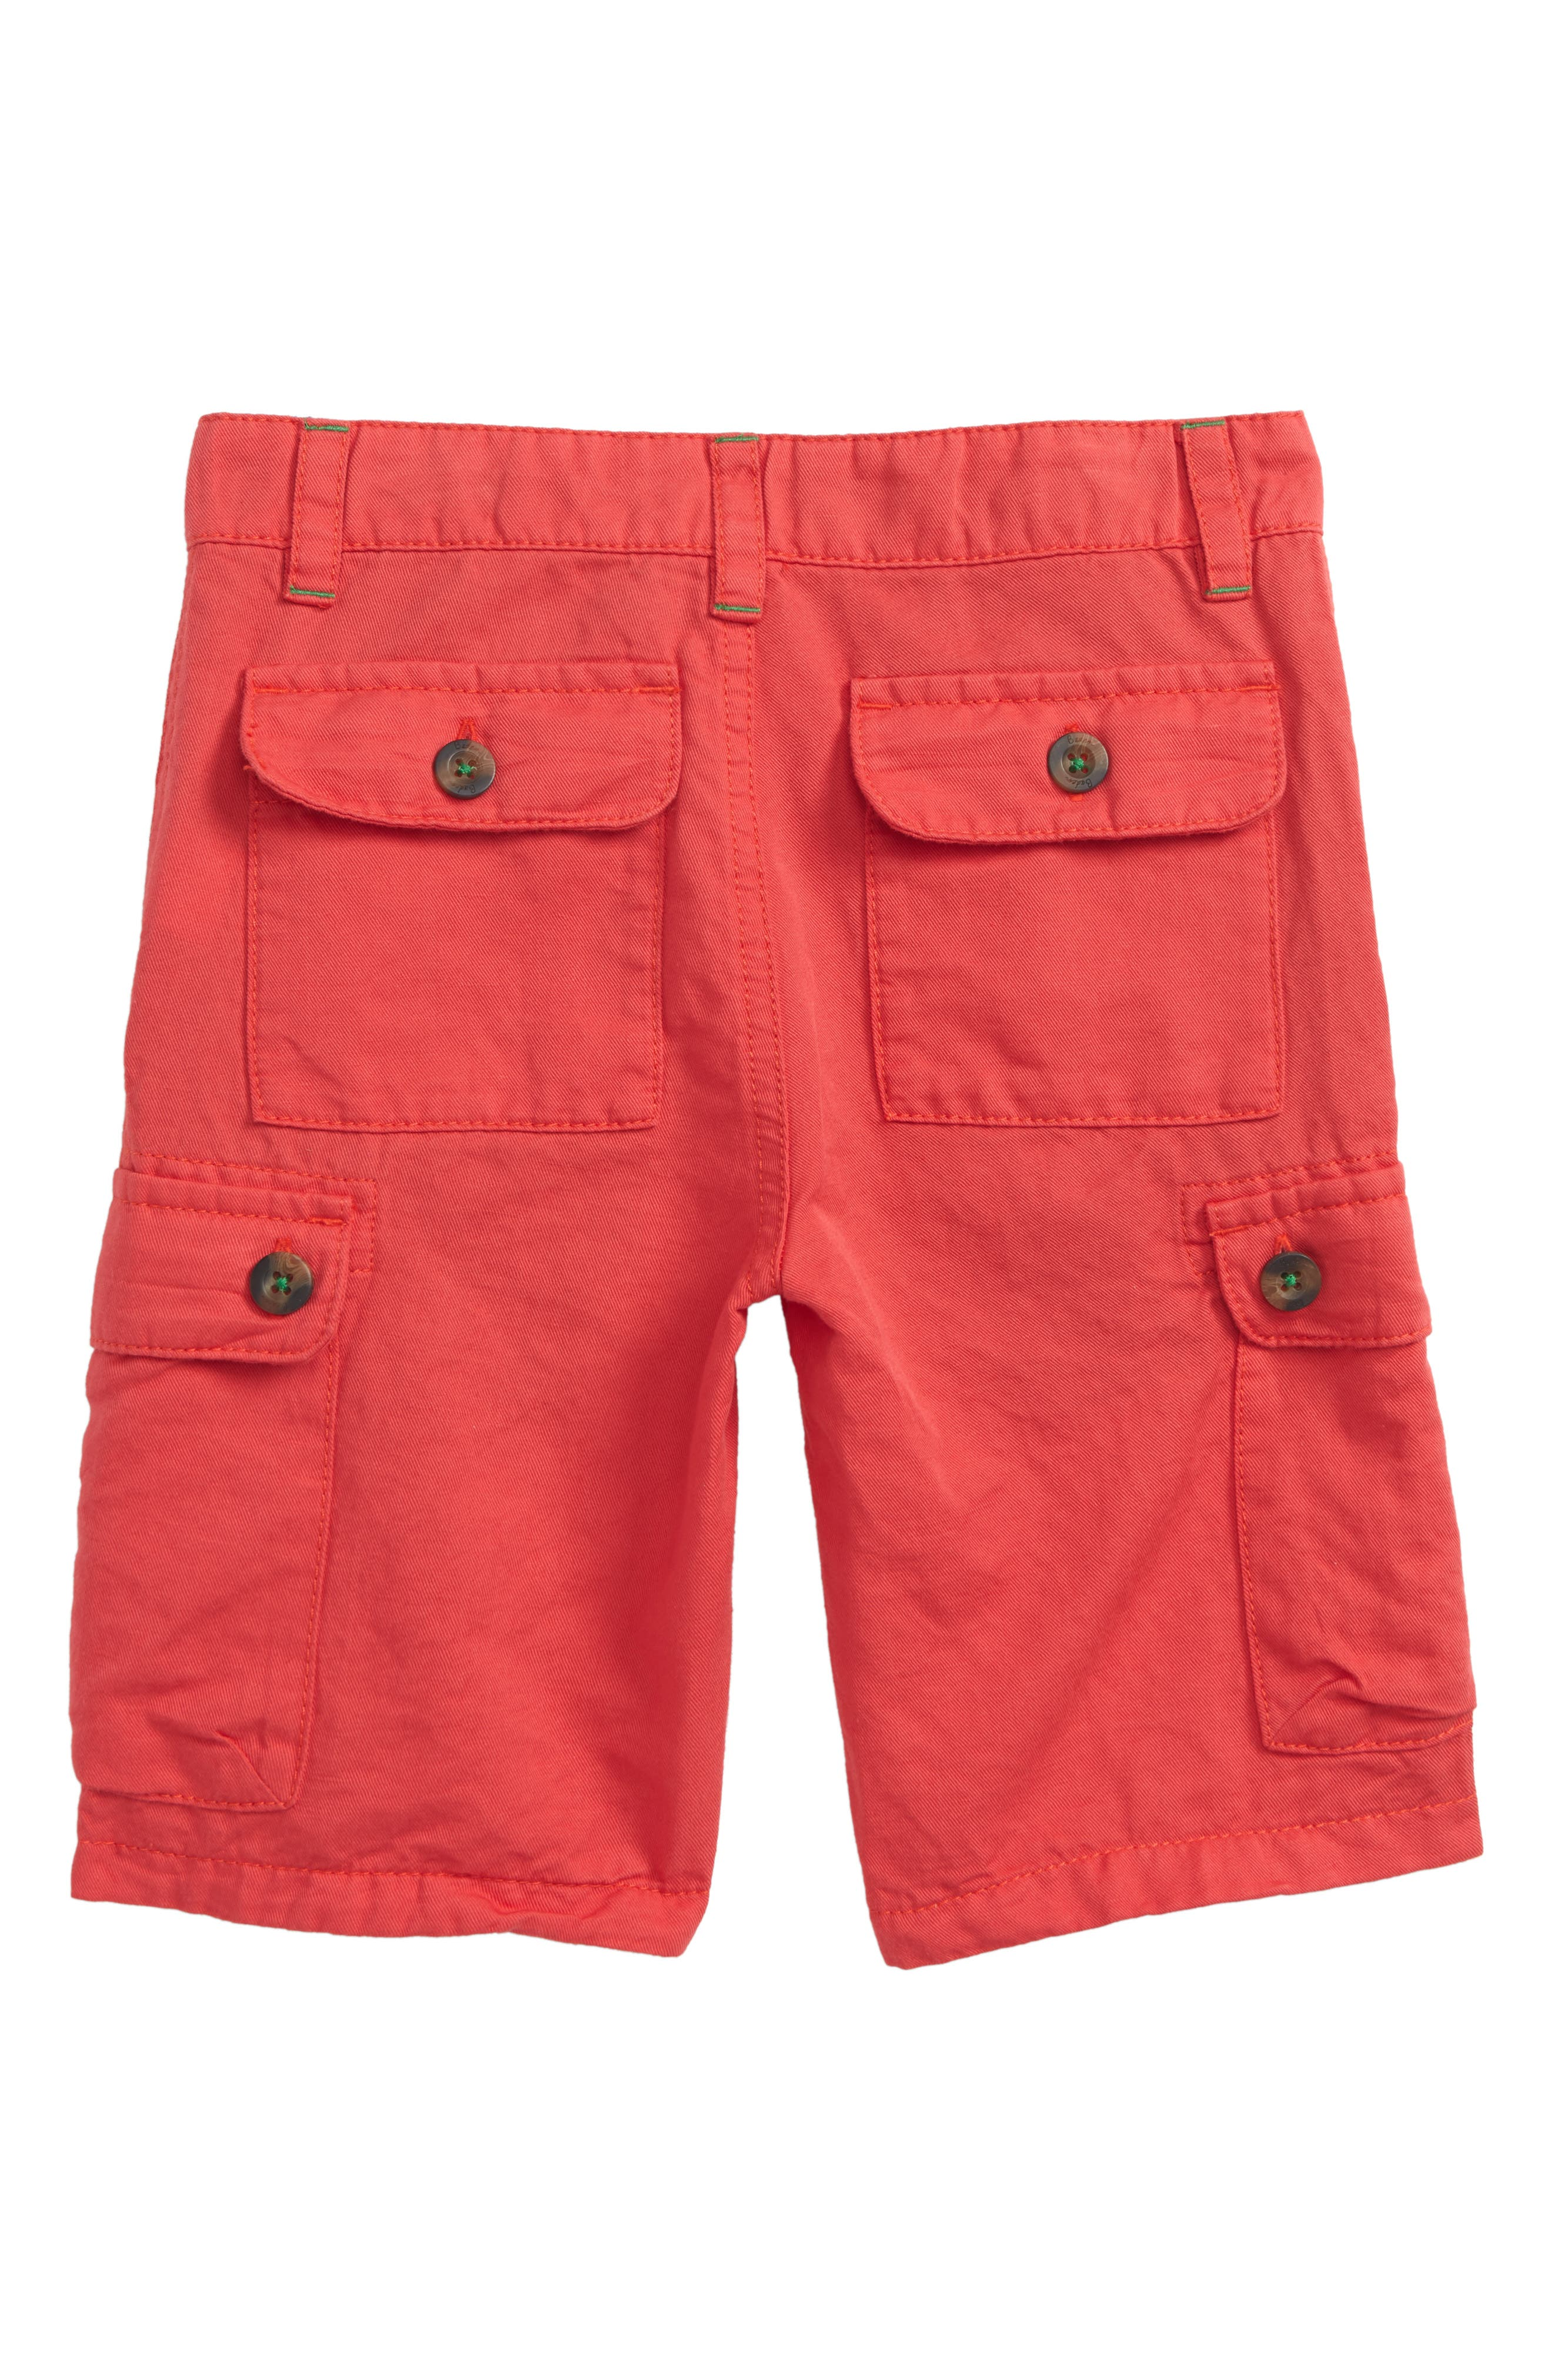 Summer Cargo Shorts,                             Alternate thumbnail 2, color,                             Jam Red